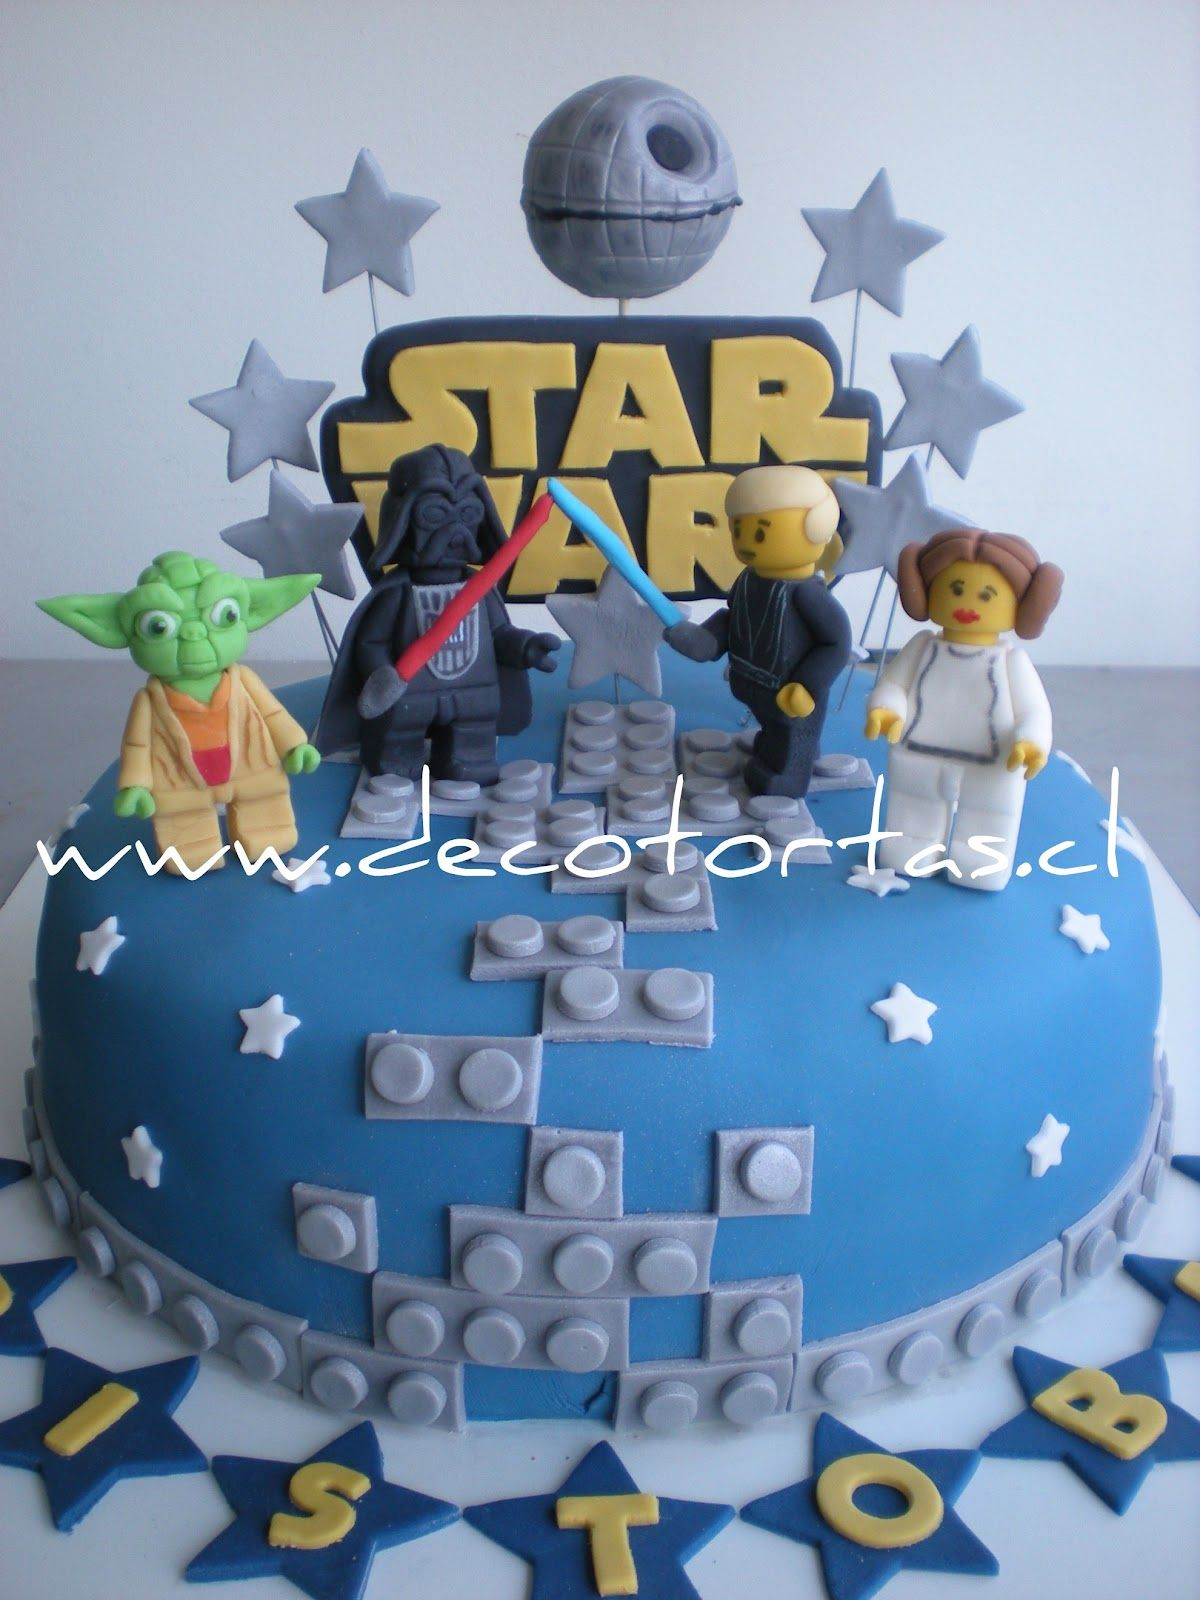 Decotortas Lego Star Wars Cake Decorating Pinterest Lego Star